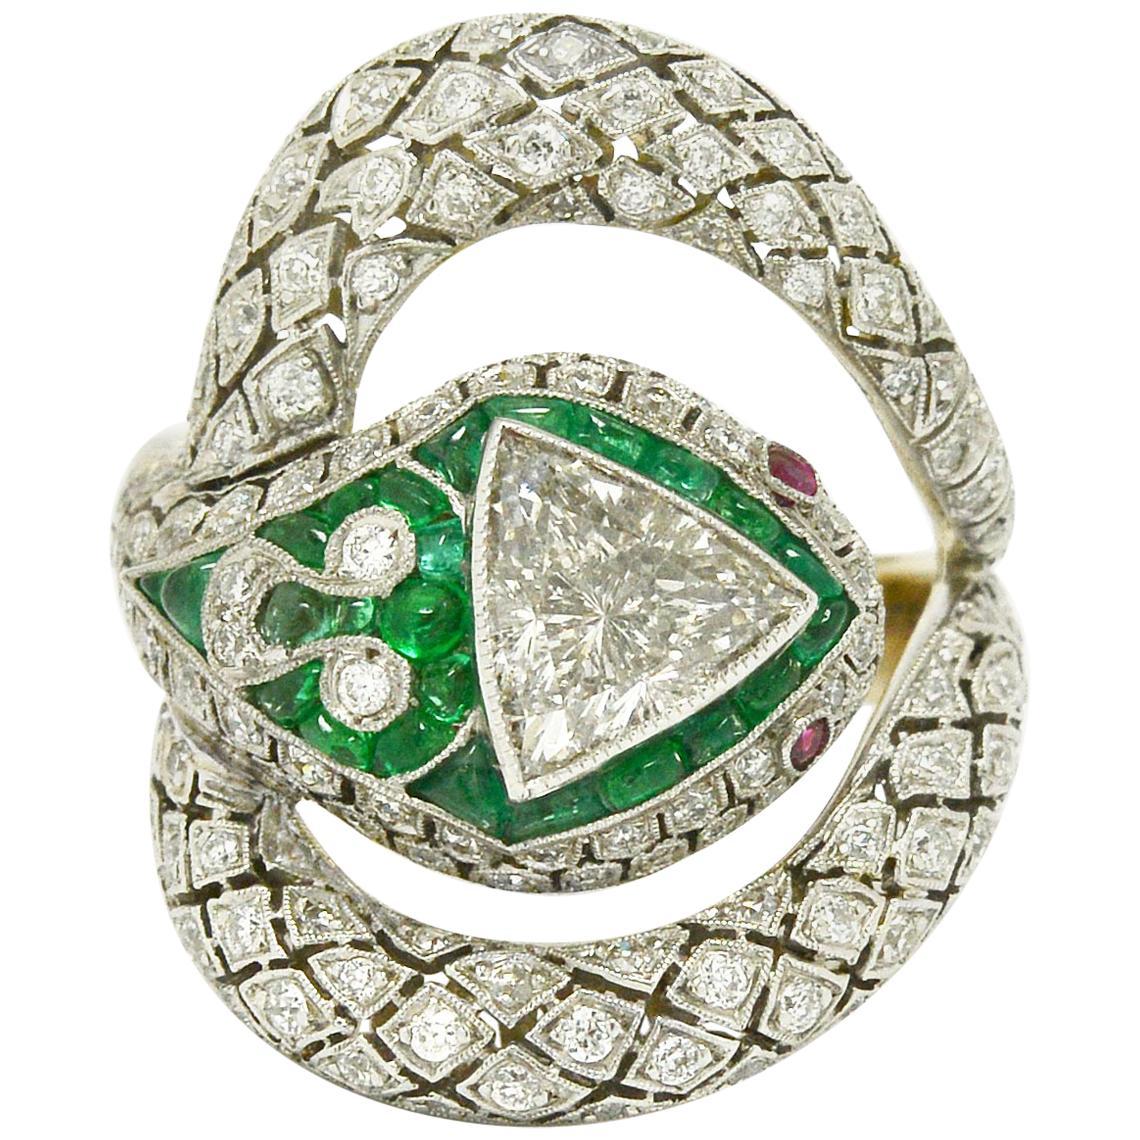 Art Deco Style Snake Ring 1.17 Carat Trillion Diamond Emerald Ruby Egyptian